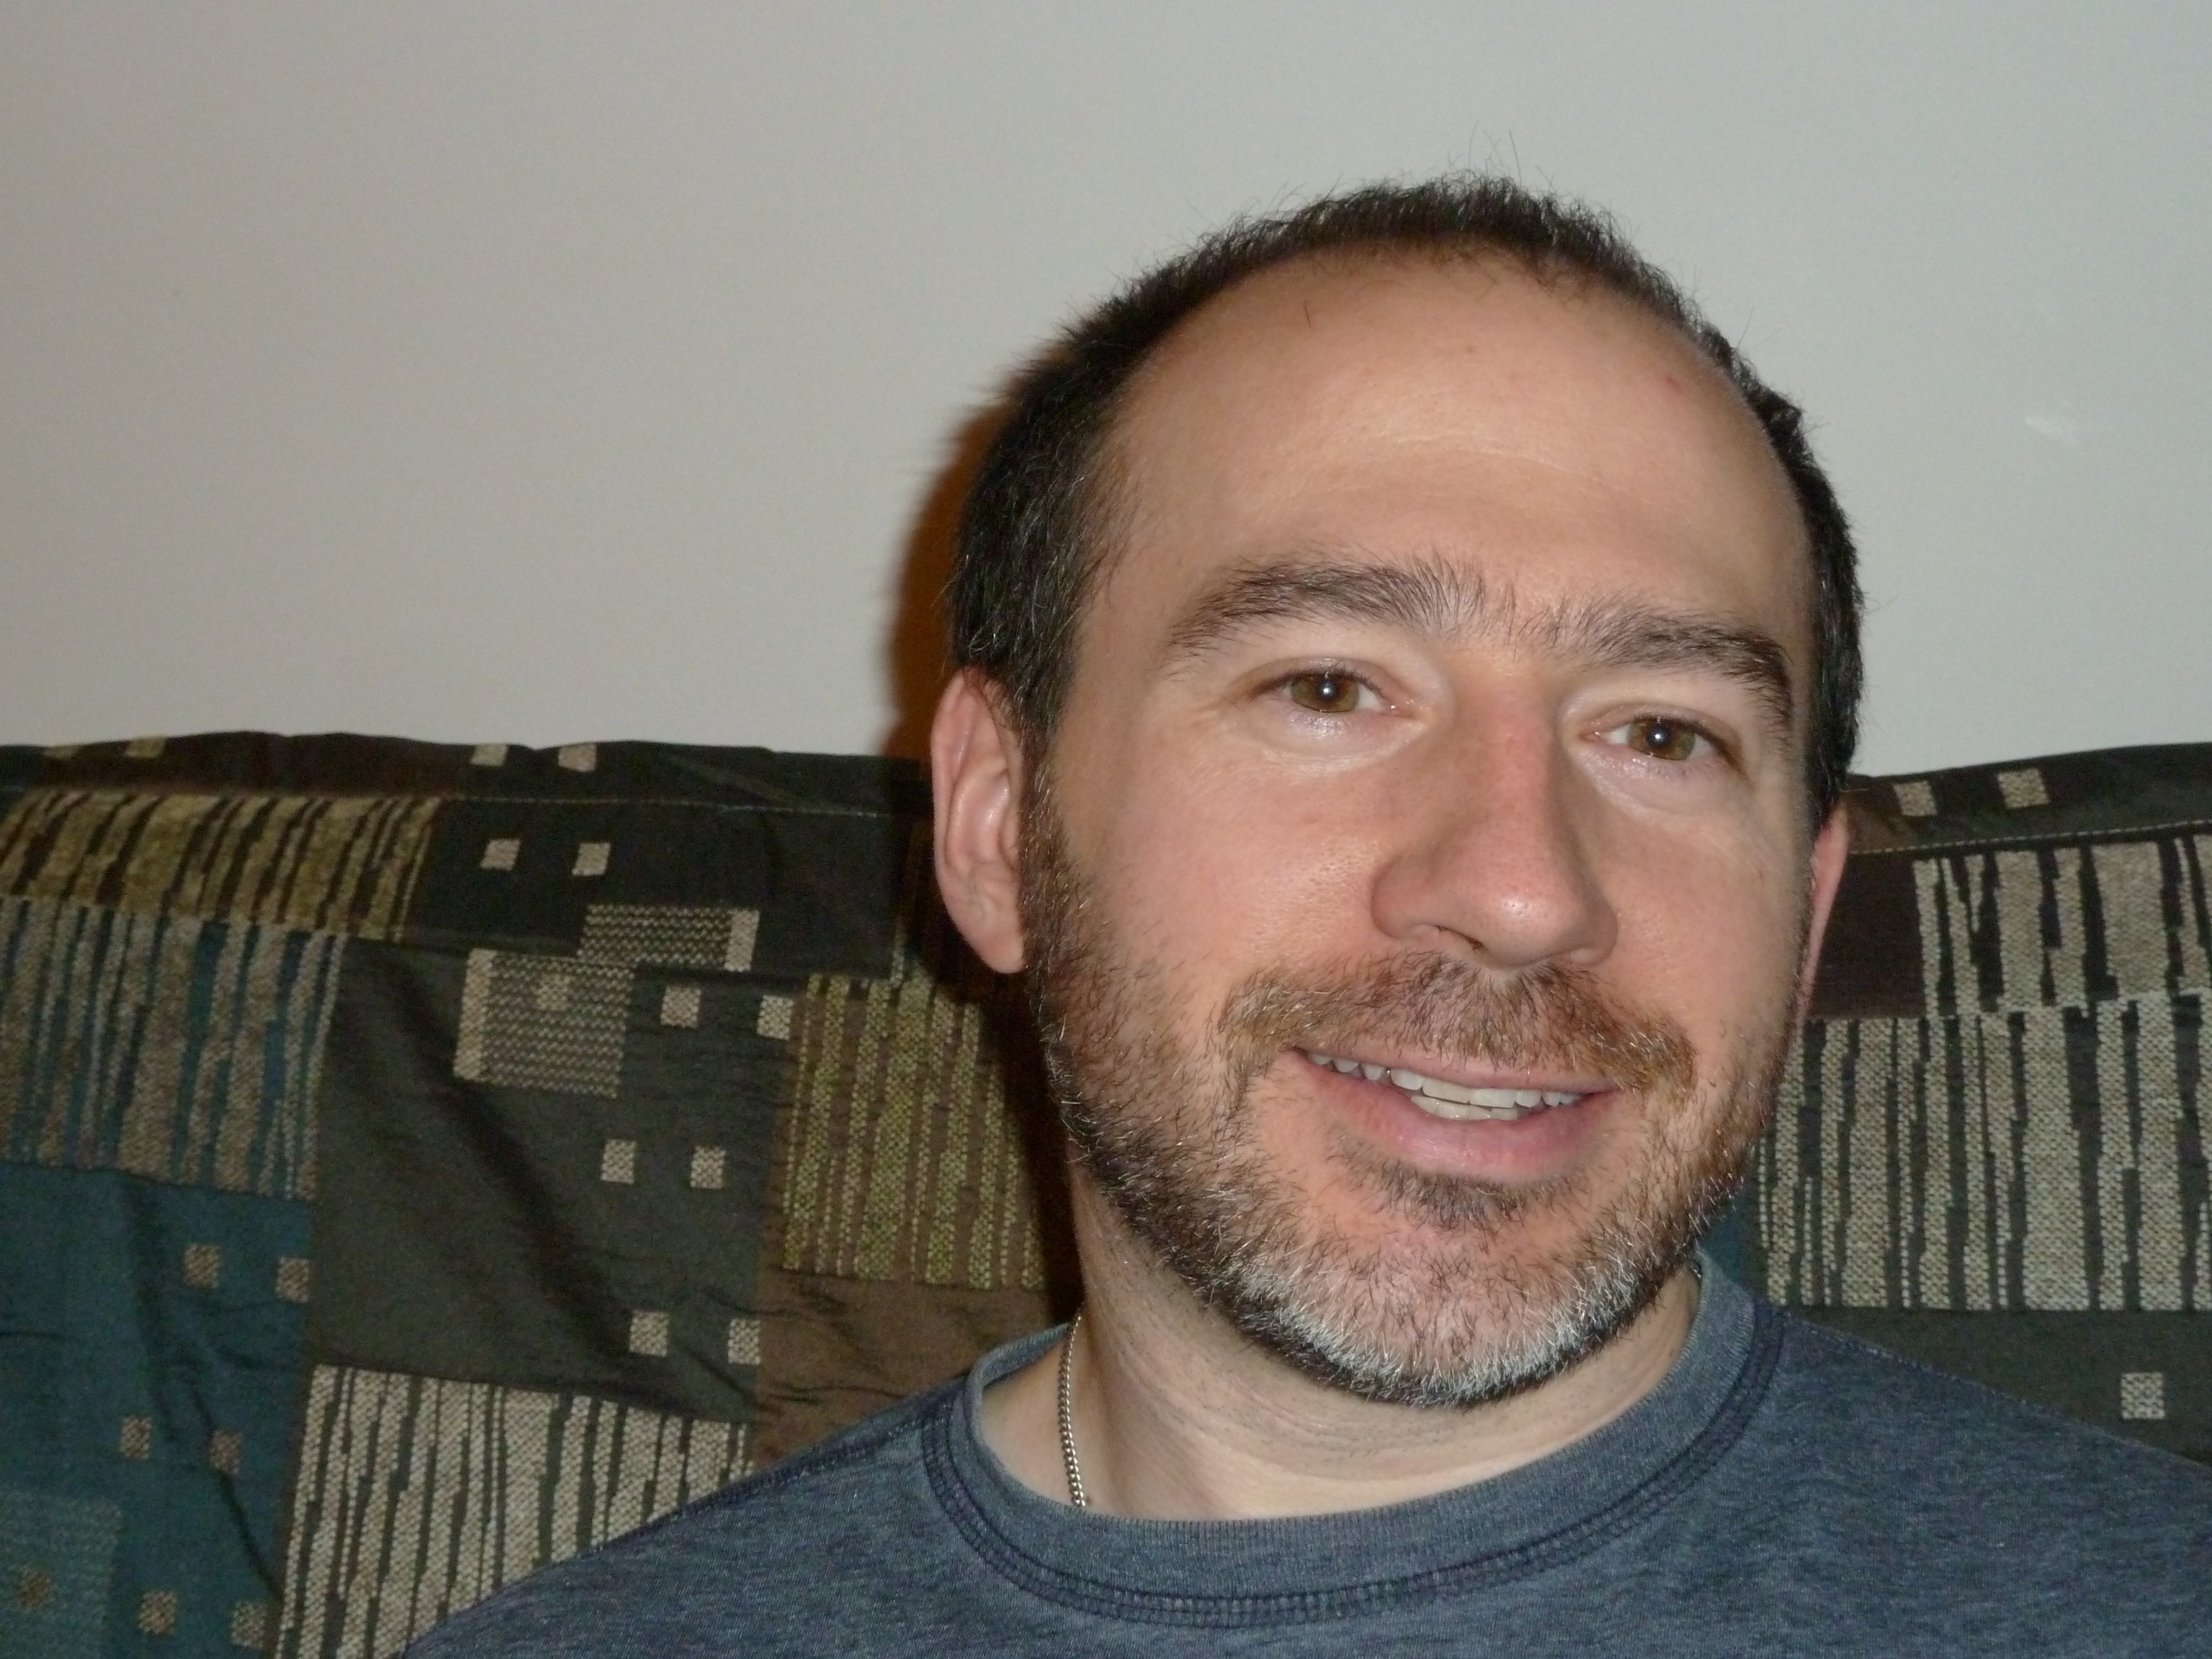 Mike Minchin, Mud Season Review author